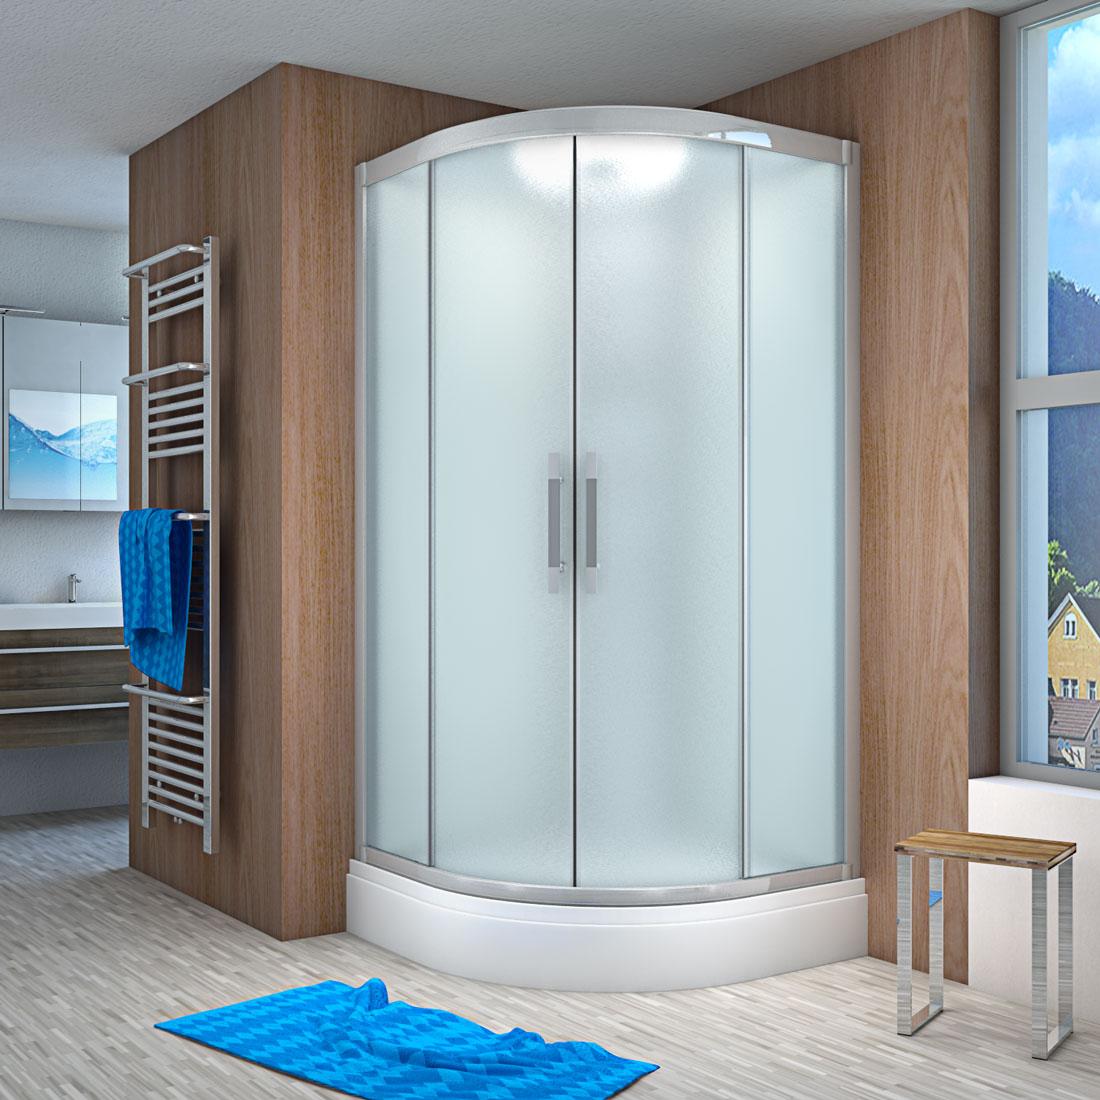 acquavapore quick26 1013 ws dusche 90x90cm. Black Bedroom Furniture Sets. Home Design Ideas